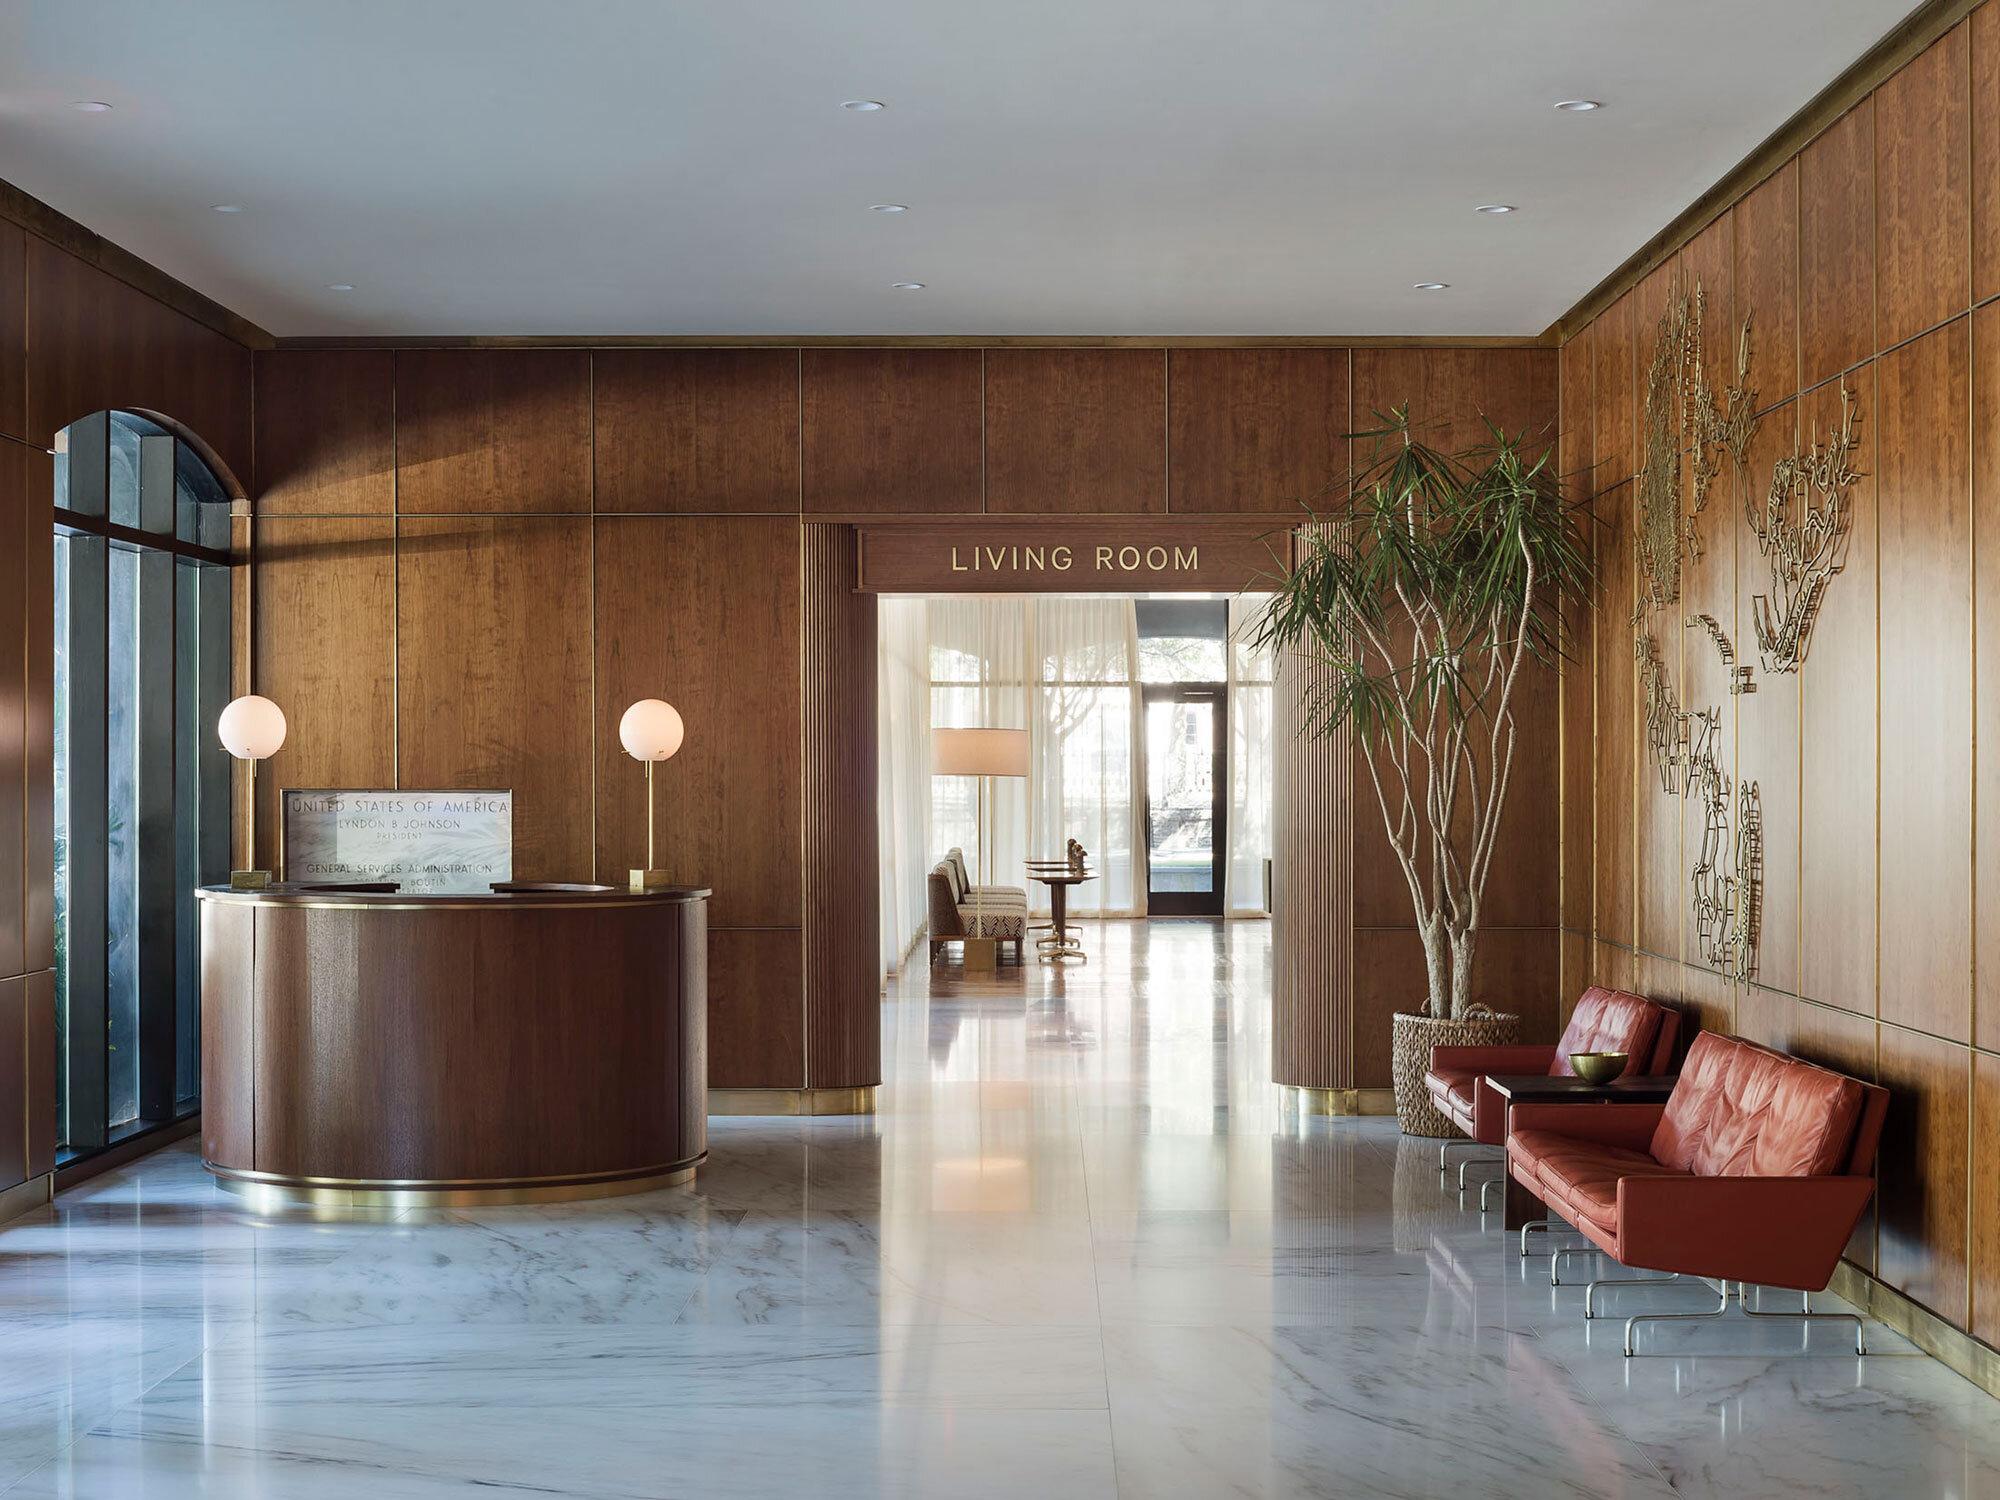 The-Dewberry-Historic-Lobby.jpg